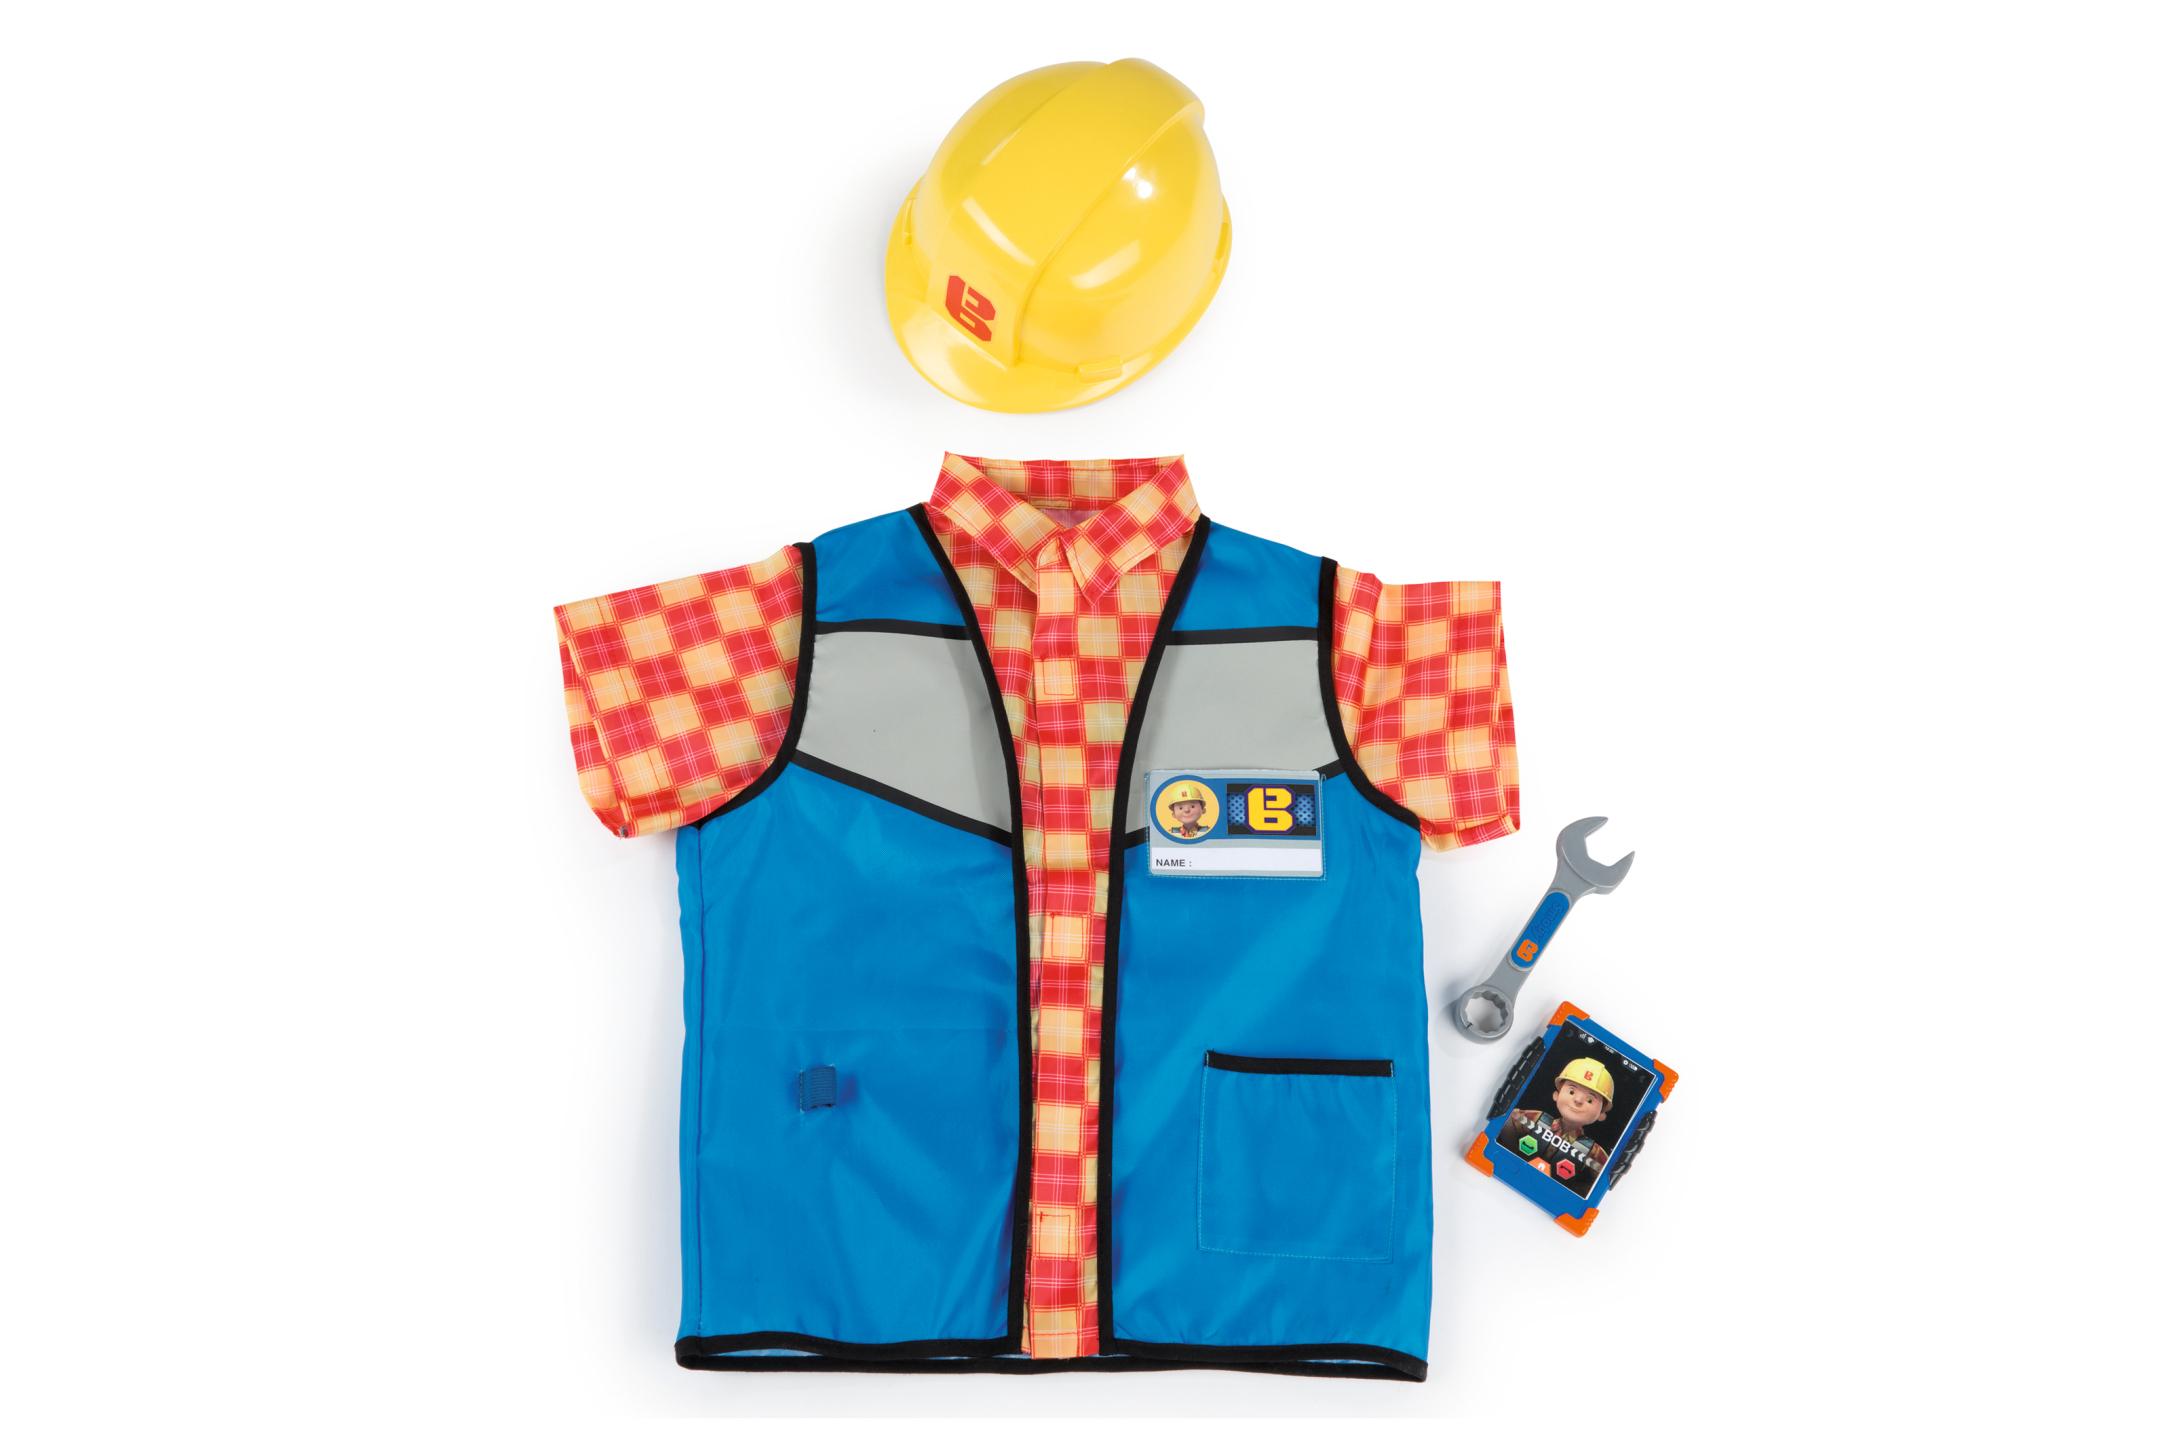 Bob der Baumeister Handwerker Outfit